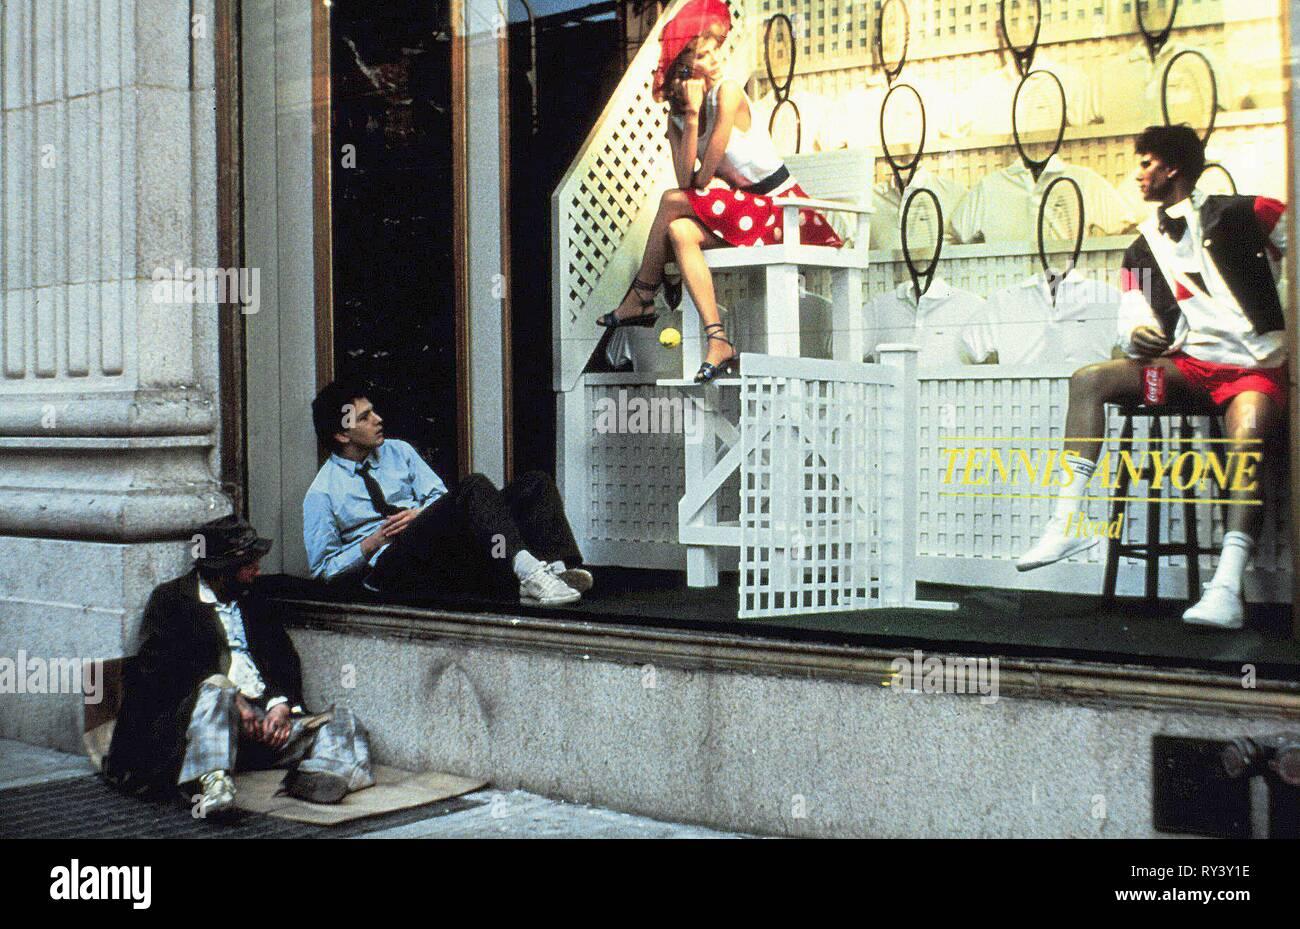 ANDREW MCCARTHY, MANNEQUIN, 1987 - Stock Image